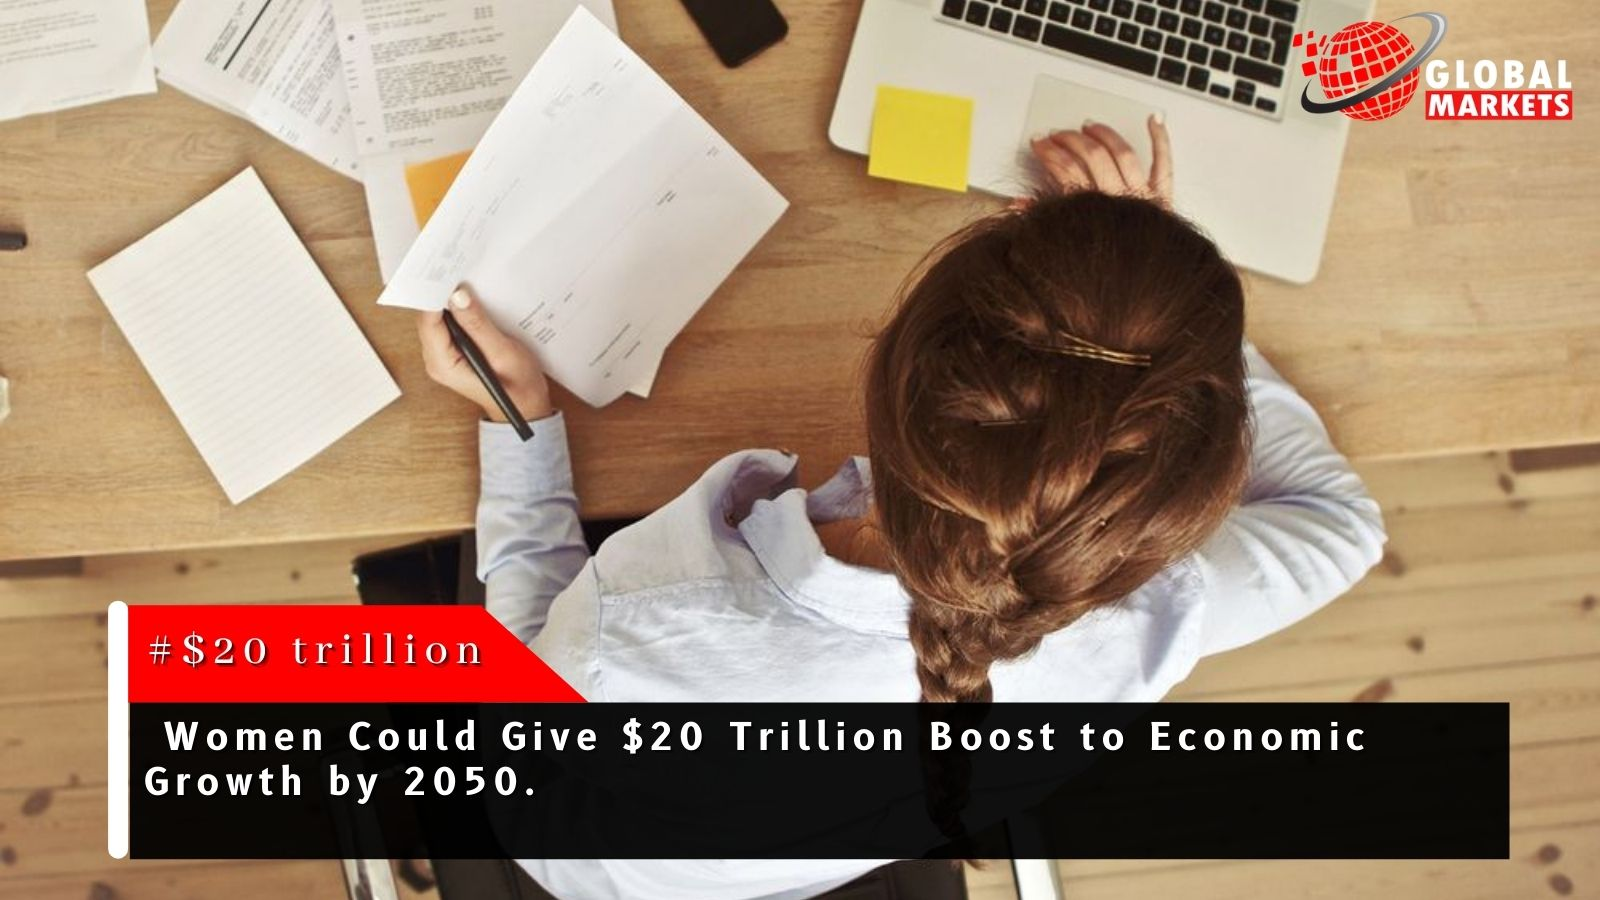 Promoting women $ 20 trillion for global economic development by 2050